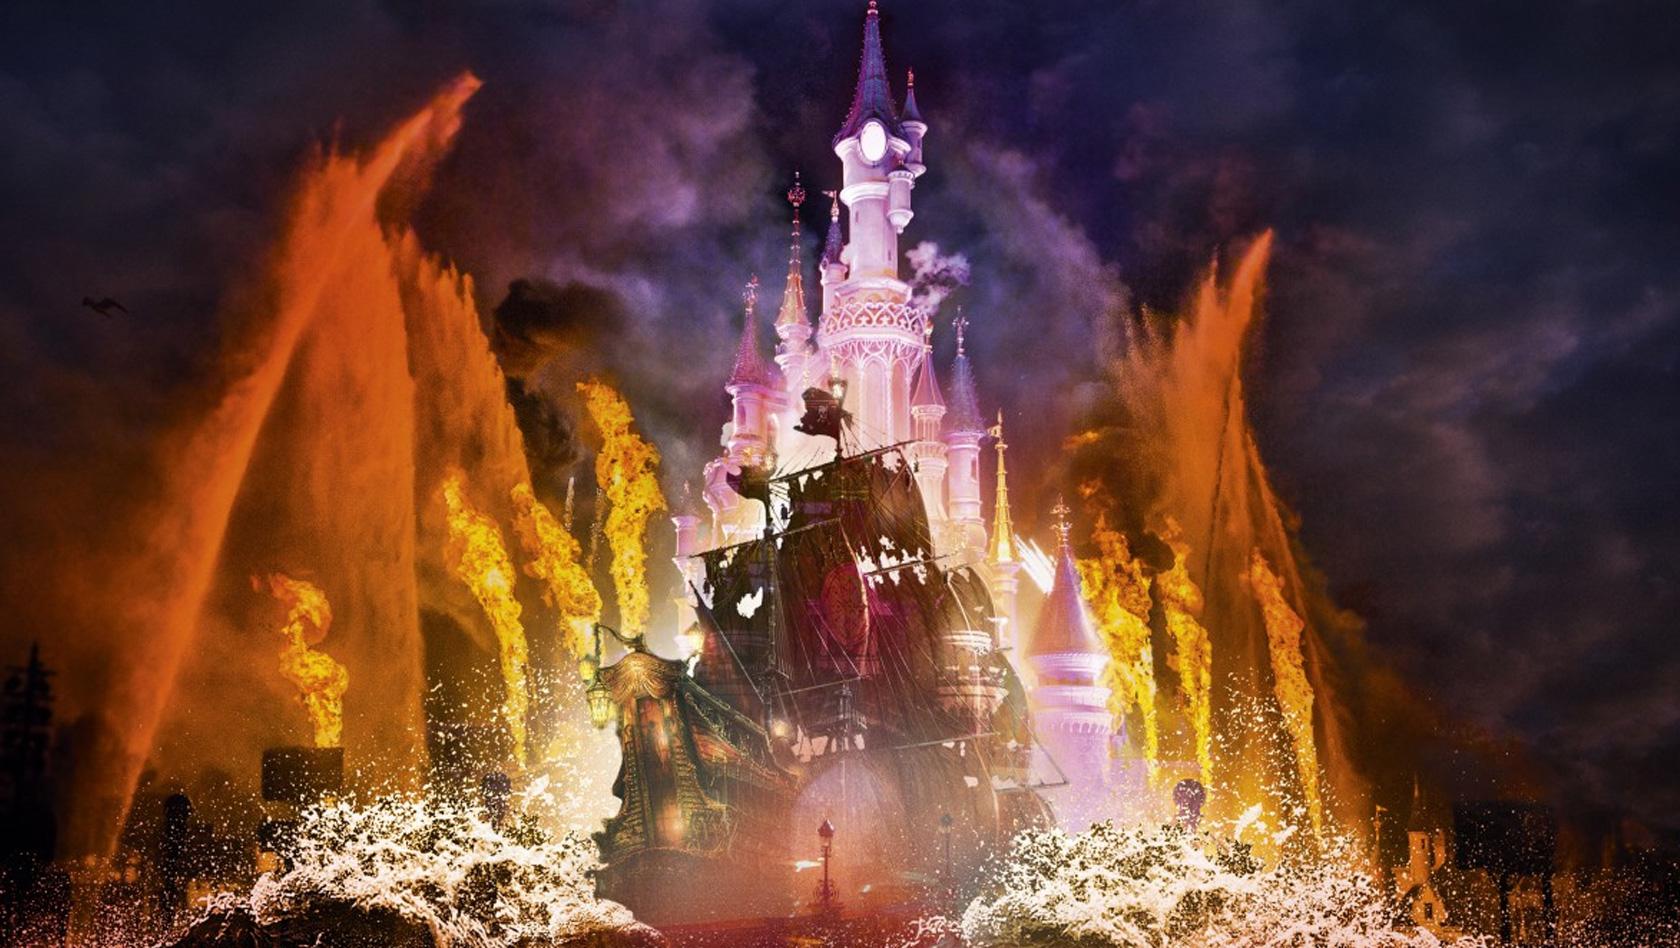 Disney illuminations 2017 in disneyland paris neue t gliche abendshow ab 26 m rz - Illumination noel paris 2017 ...